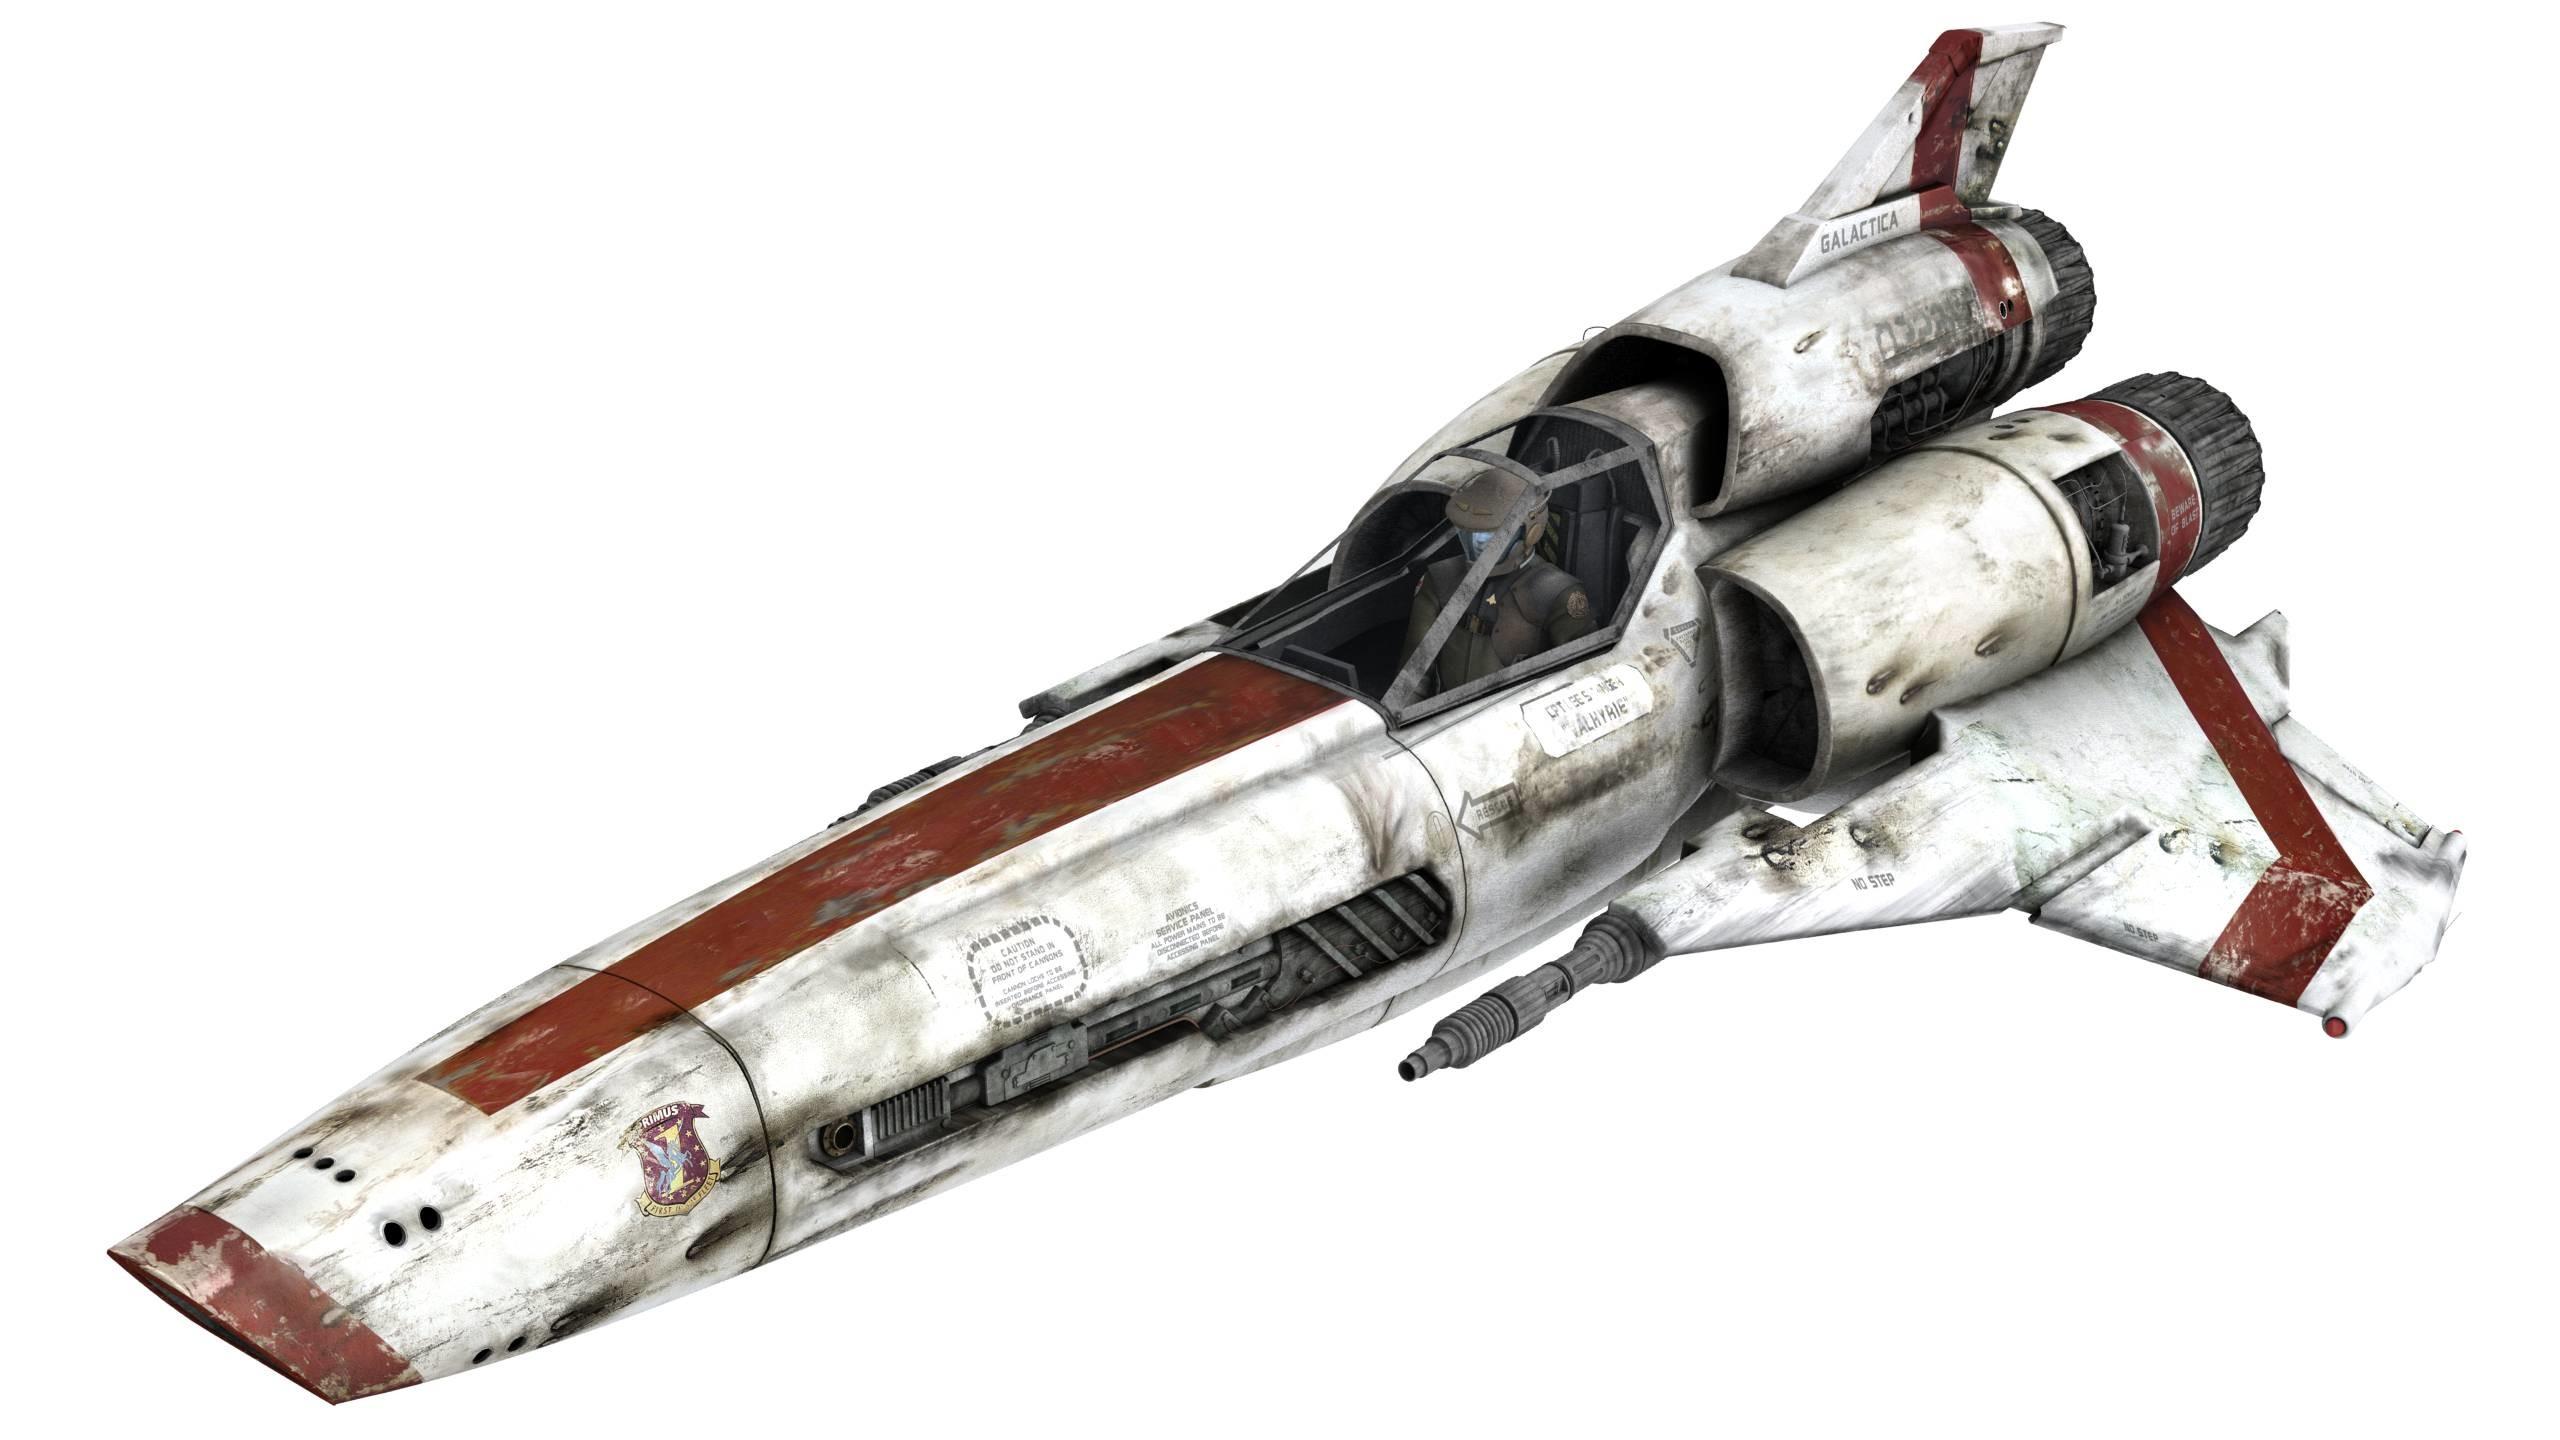 Battlestar Galactica Viper wallpaper 471048